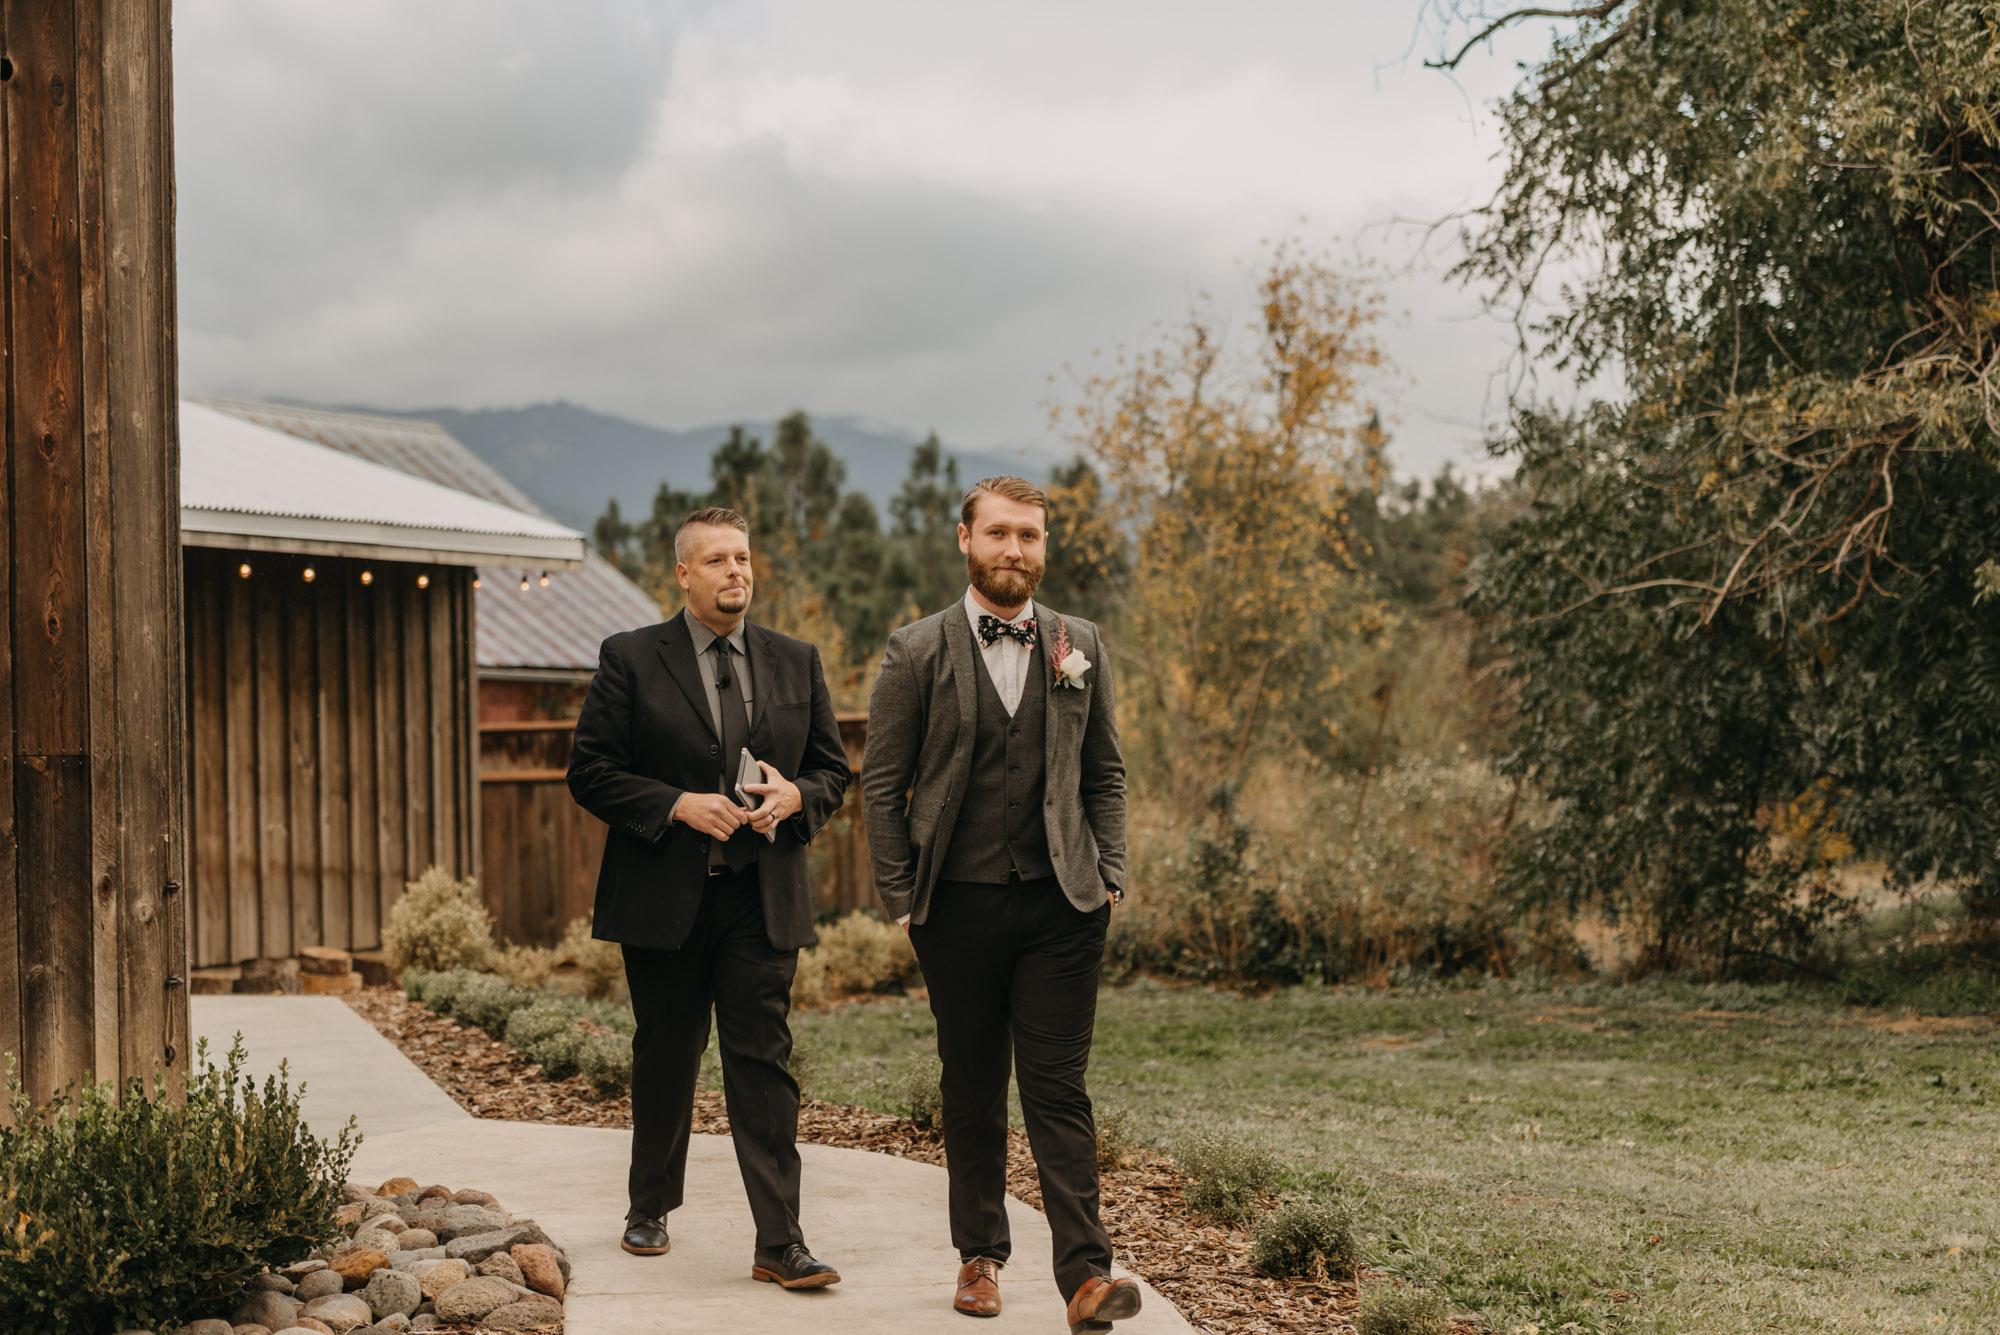 Outdoor-Summer-Ceremony-Washington-Wedding-Rainbow-8833.jpg